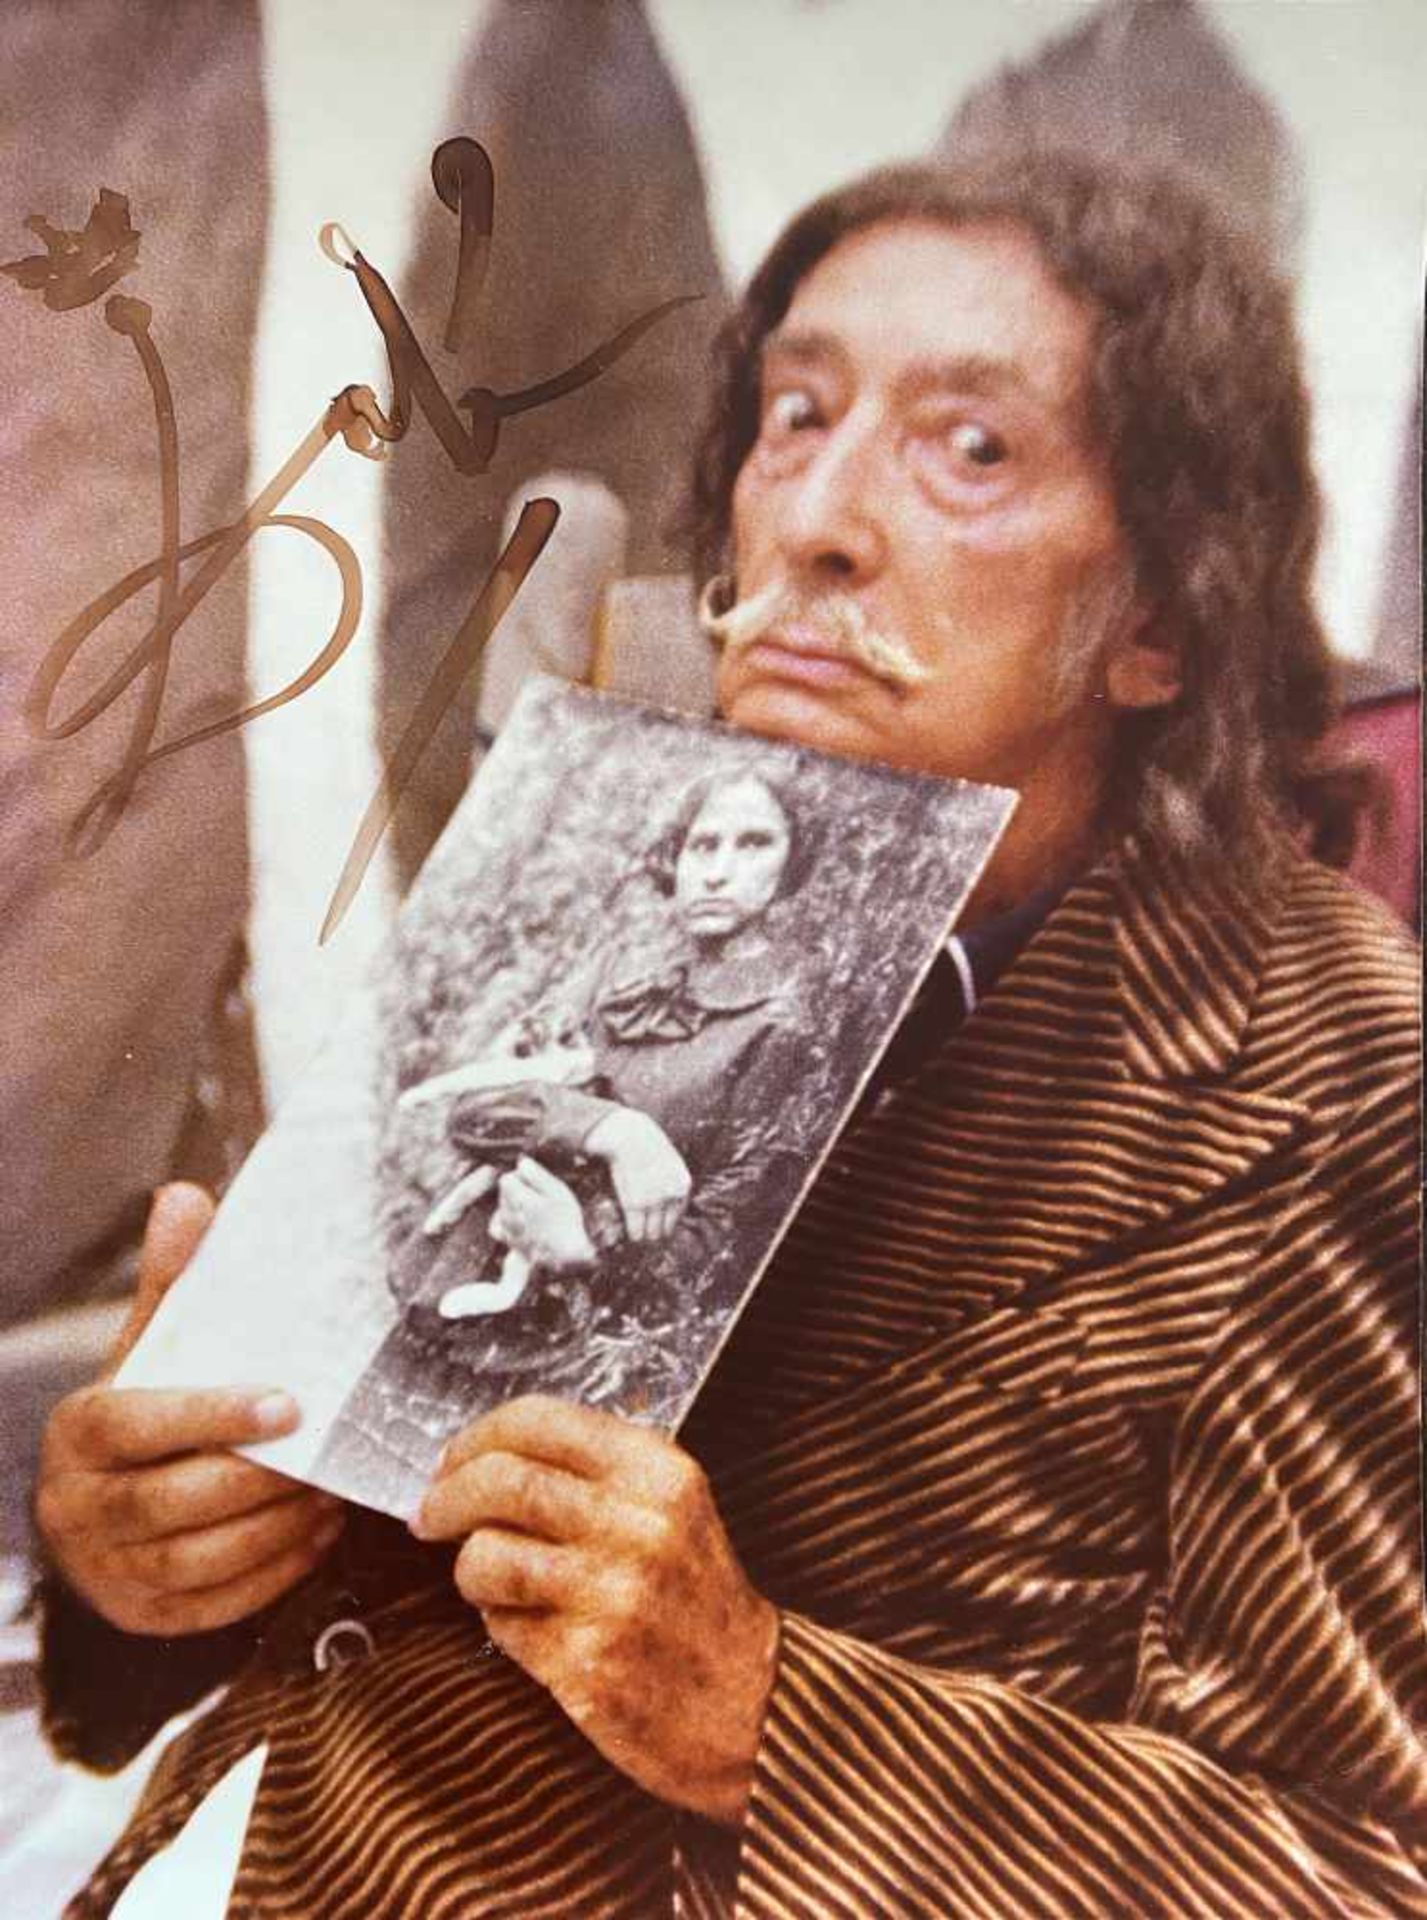 Los 13A - Salvador Dalí (Figueres, 1904 - 1989) Salvador Dalí (Figueres, 1904 - 1989) Photograph of Salvador